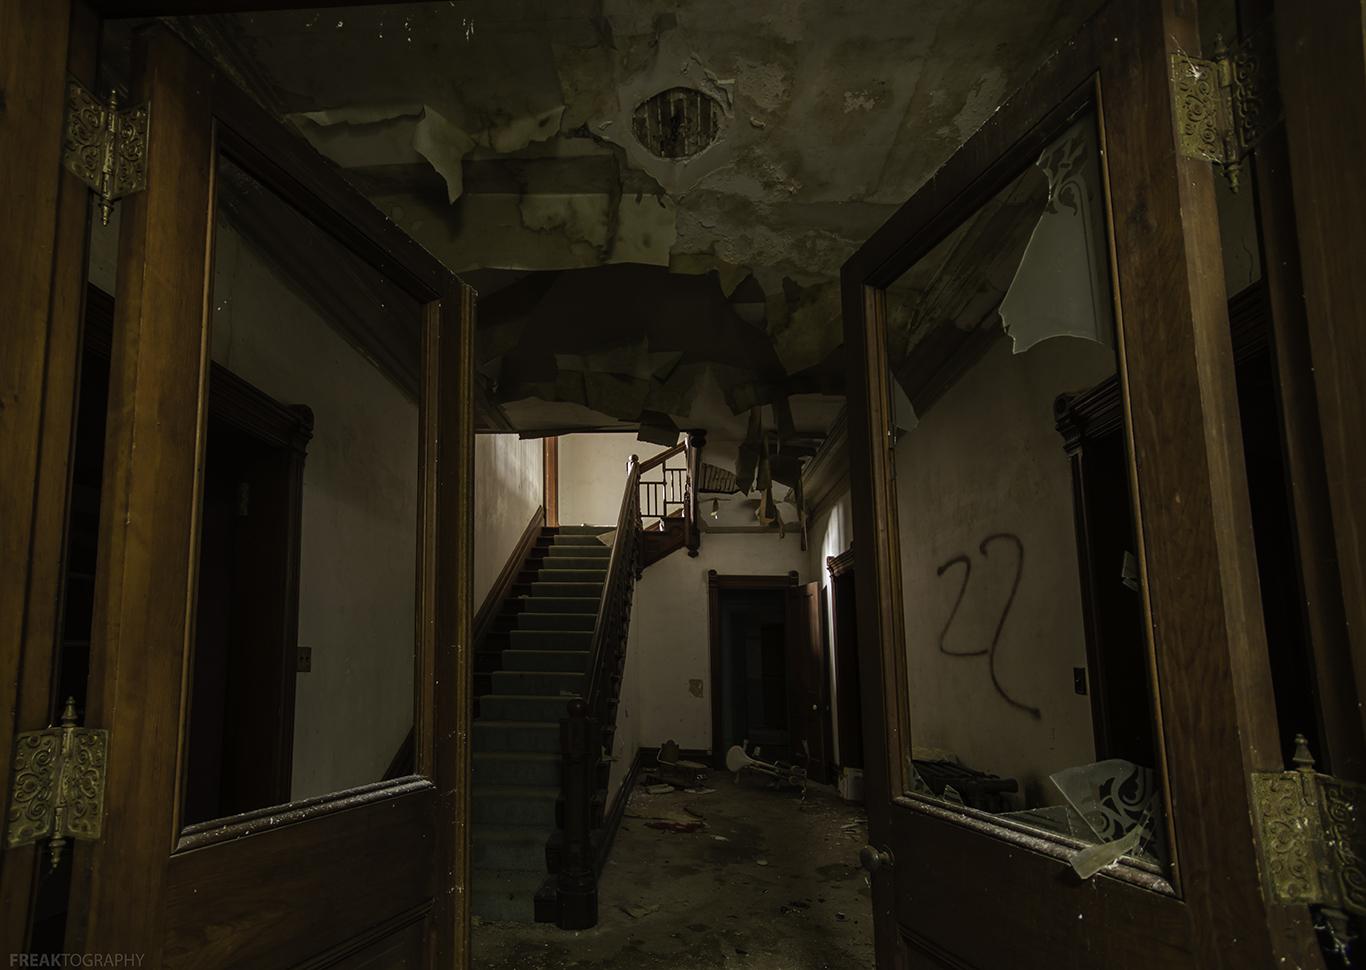 Doorway in an abandoned house in Ontario.